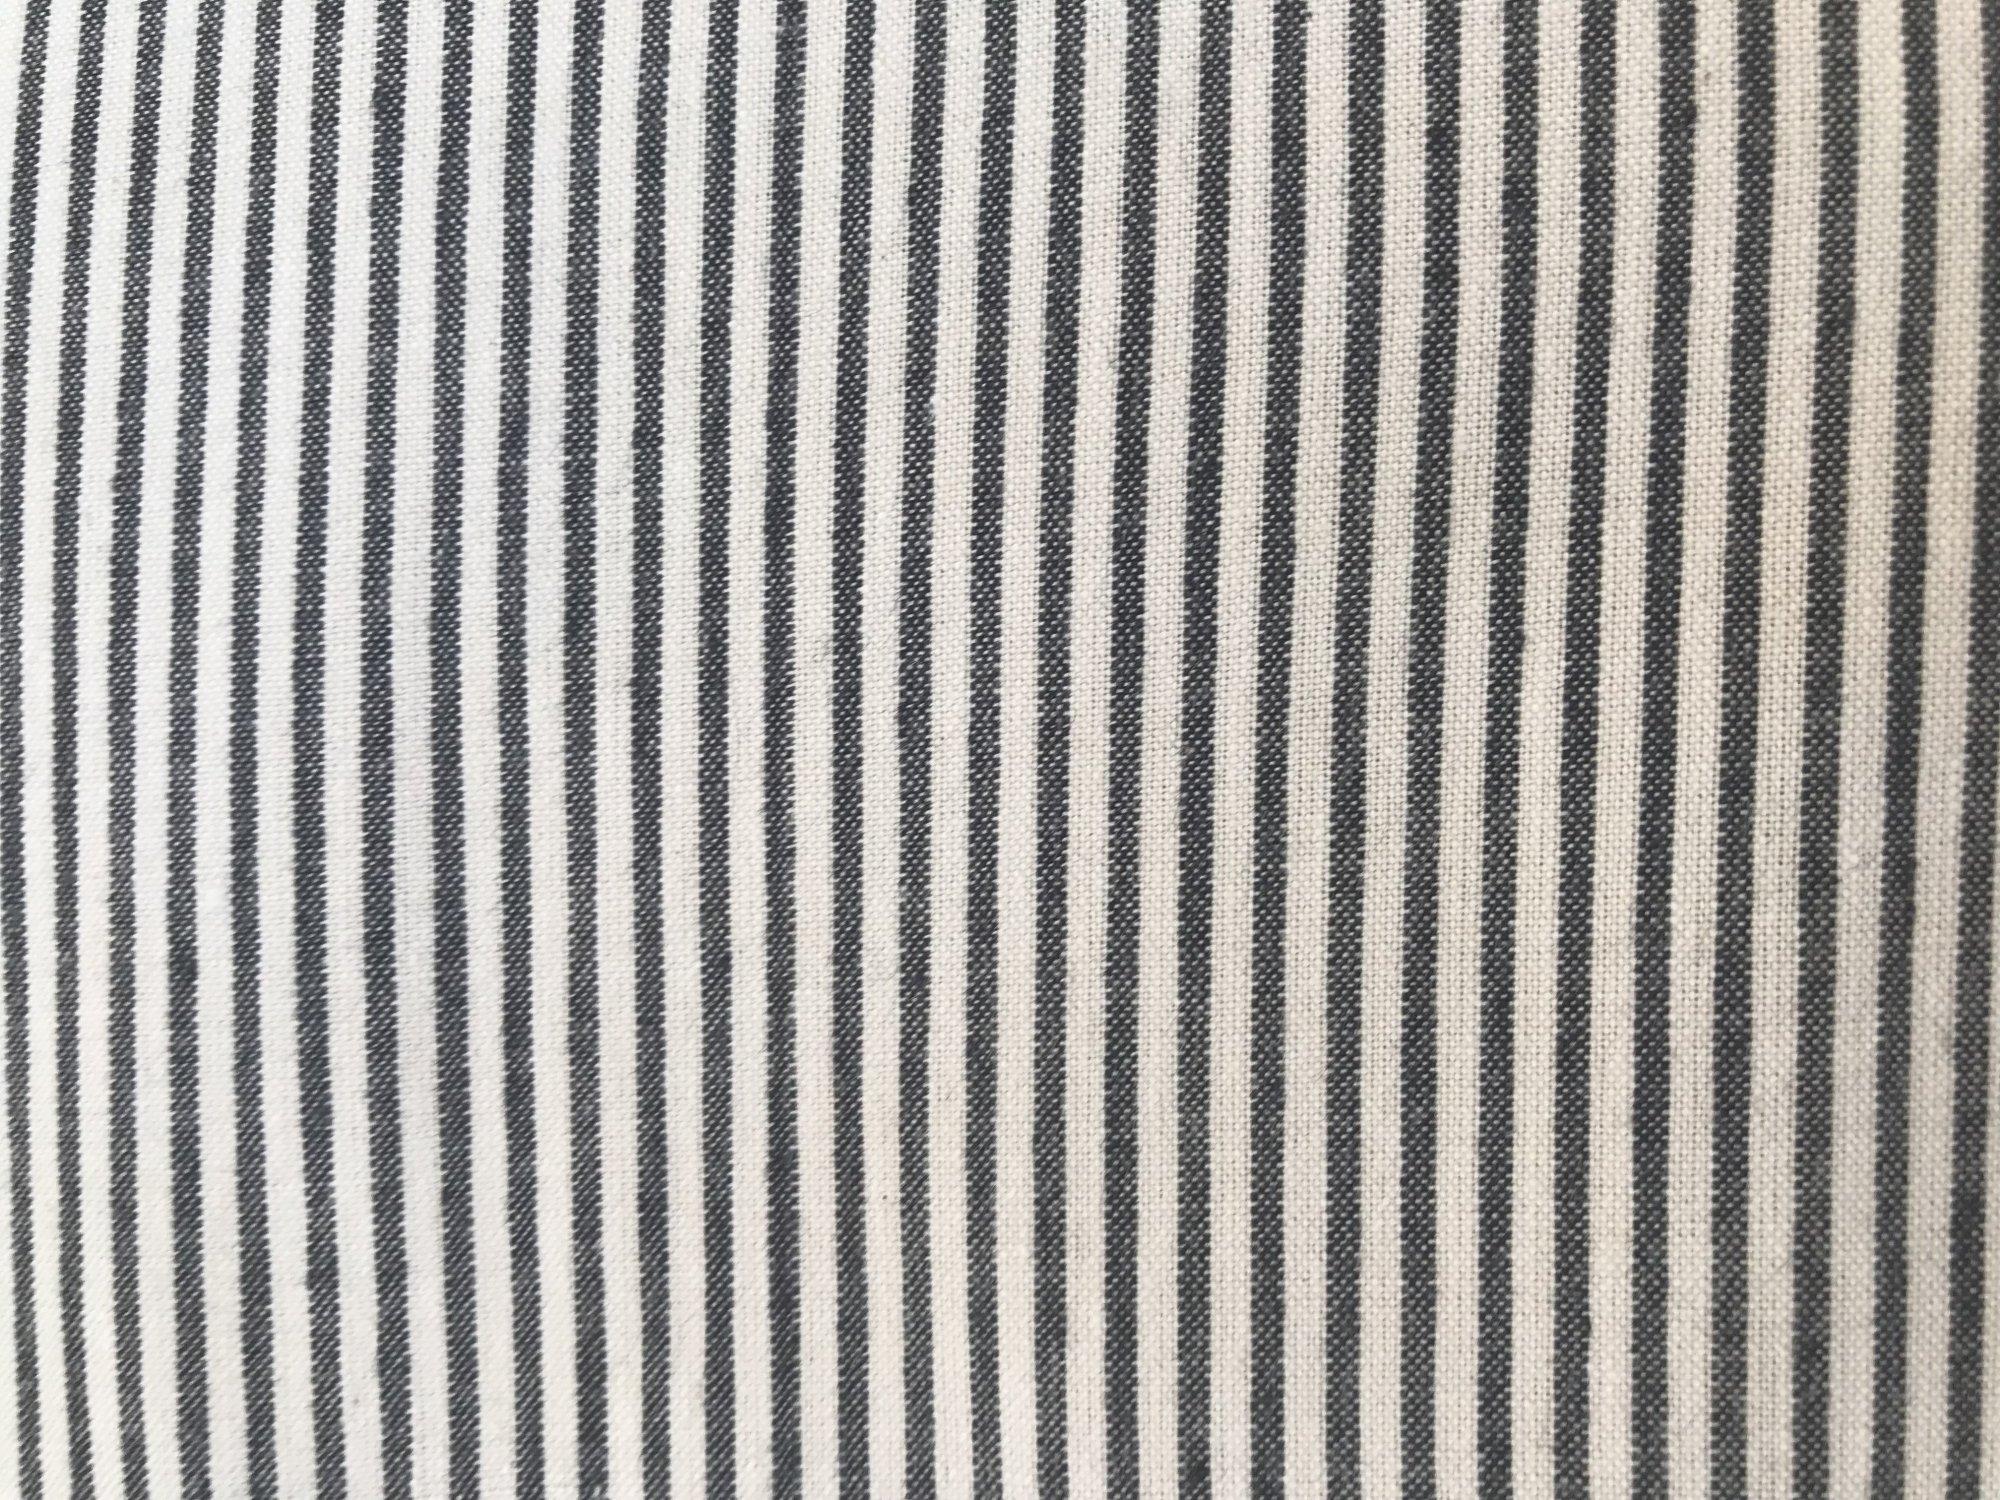 9 Piece Only Vintage Cream/Black Stripe AM 13 by Diamond Textiles